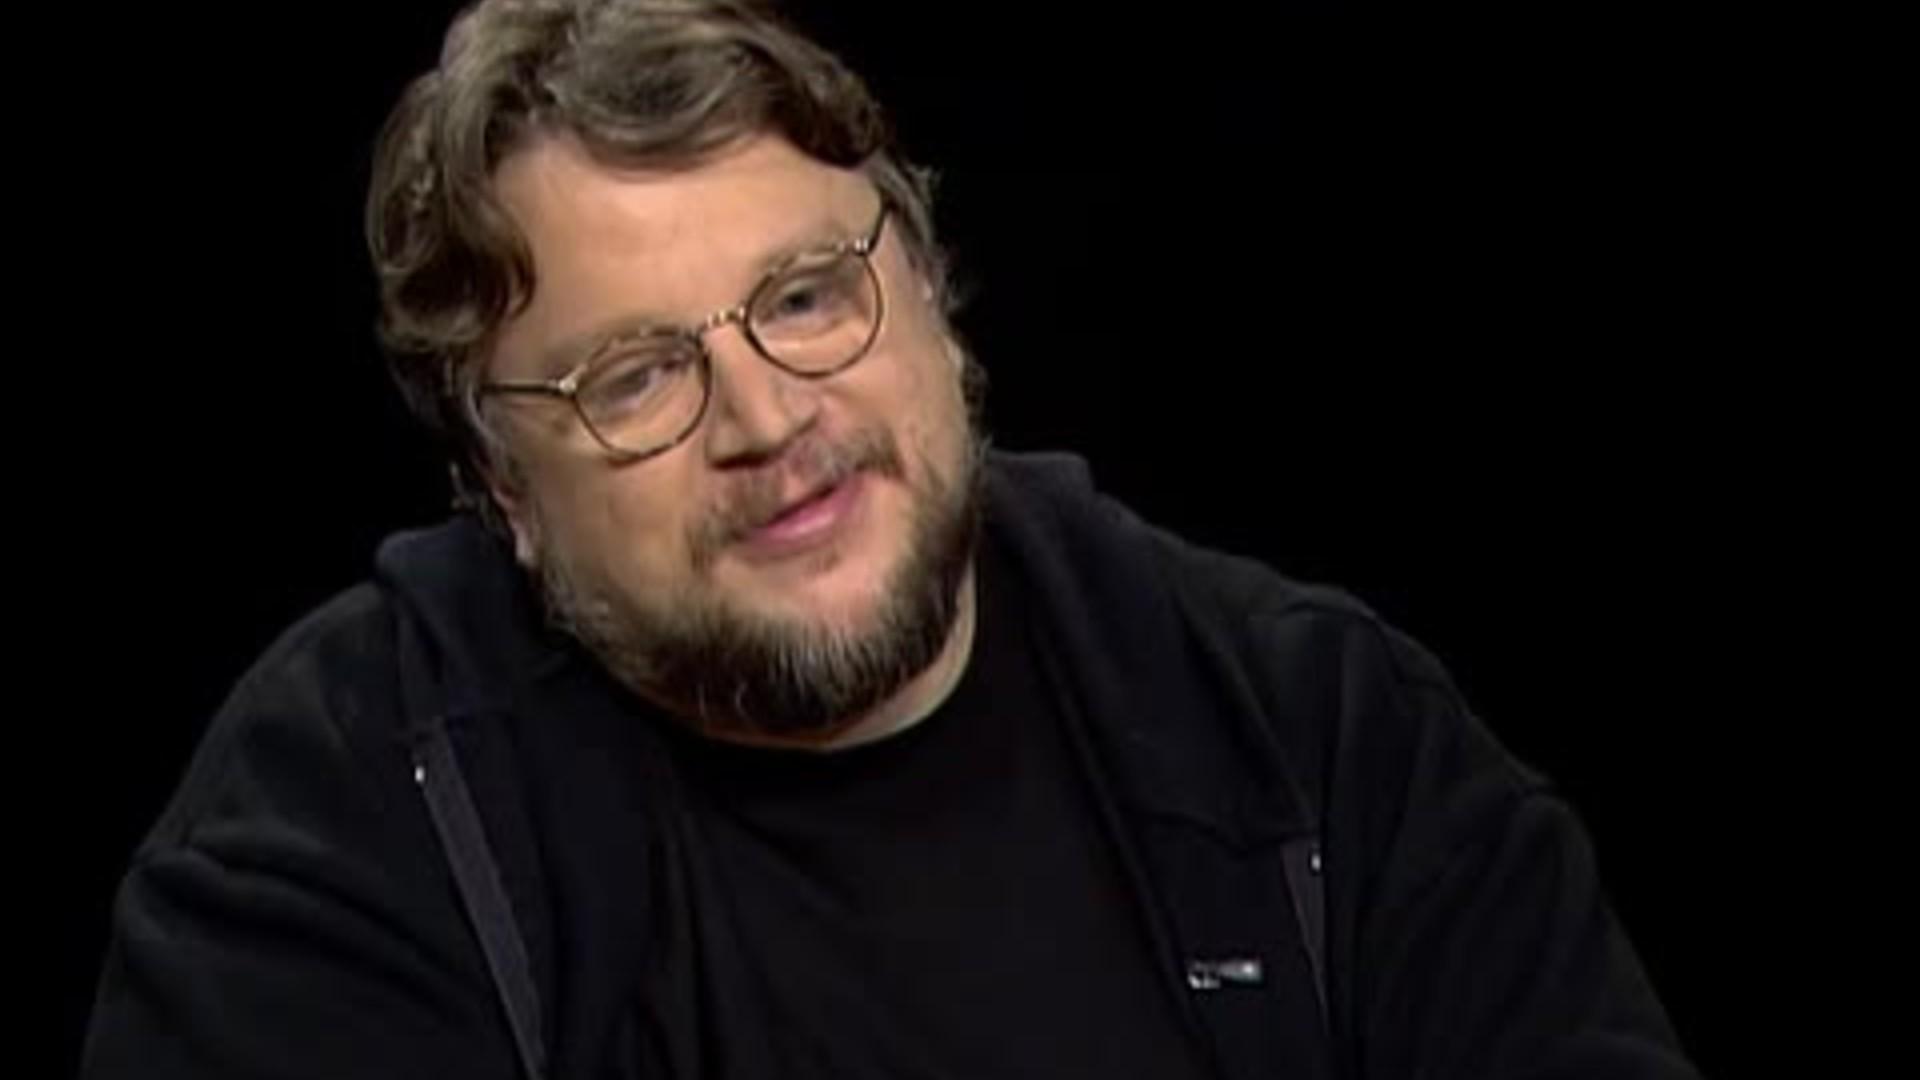 Guilhermo Del Toro throughout guillermo del toro — charlie rose